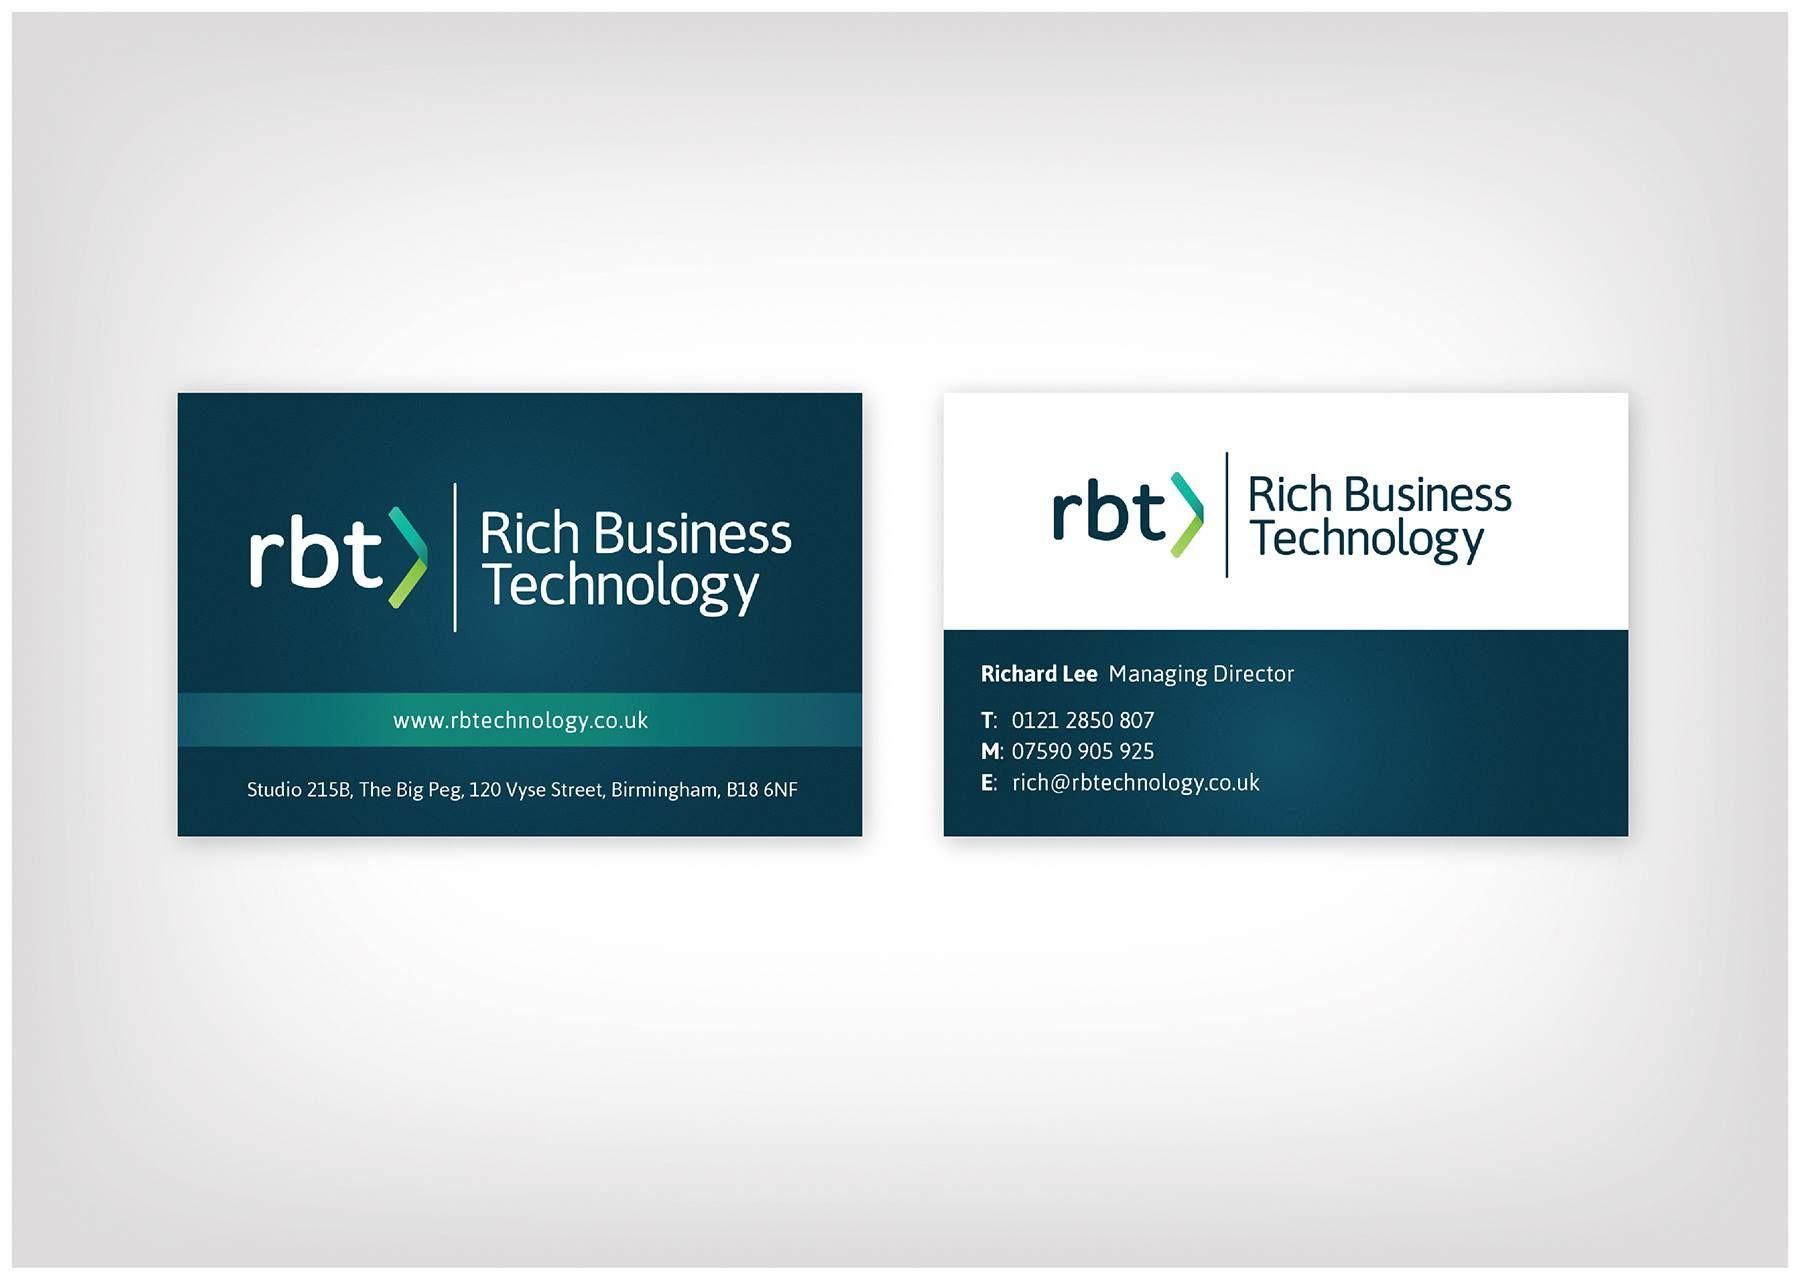 rich business technology business cards design